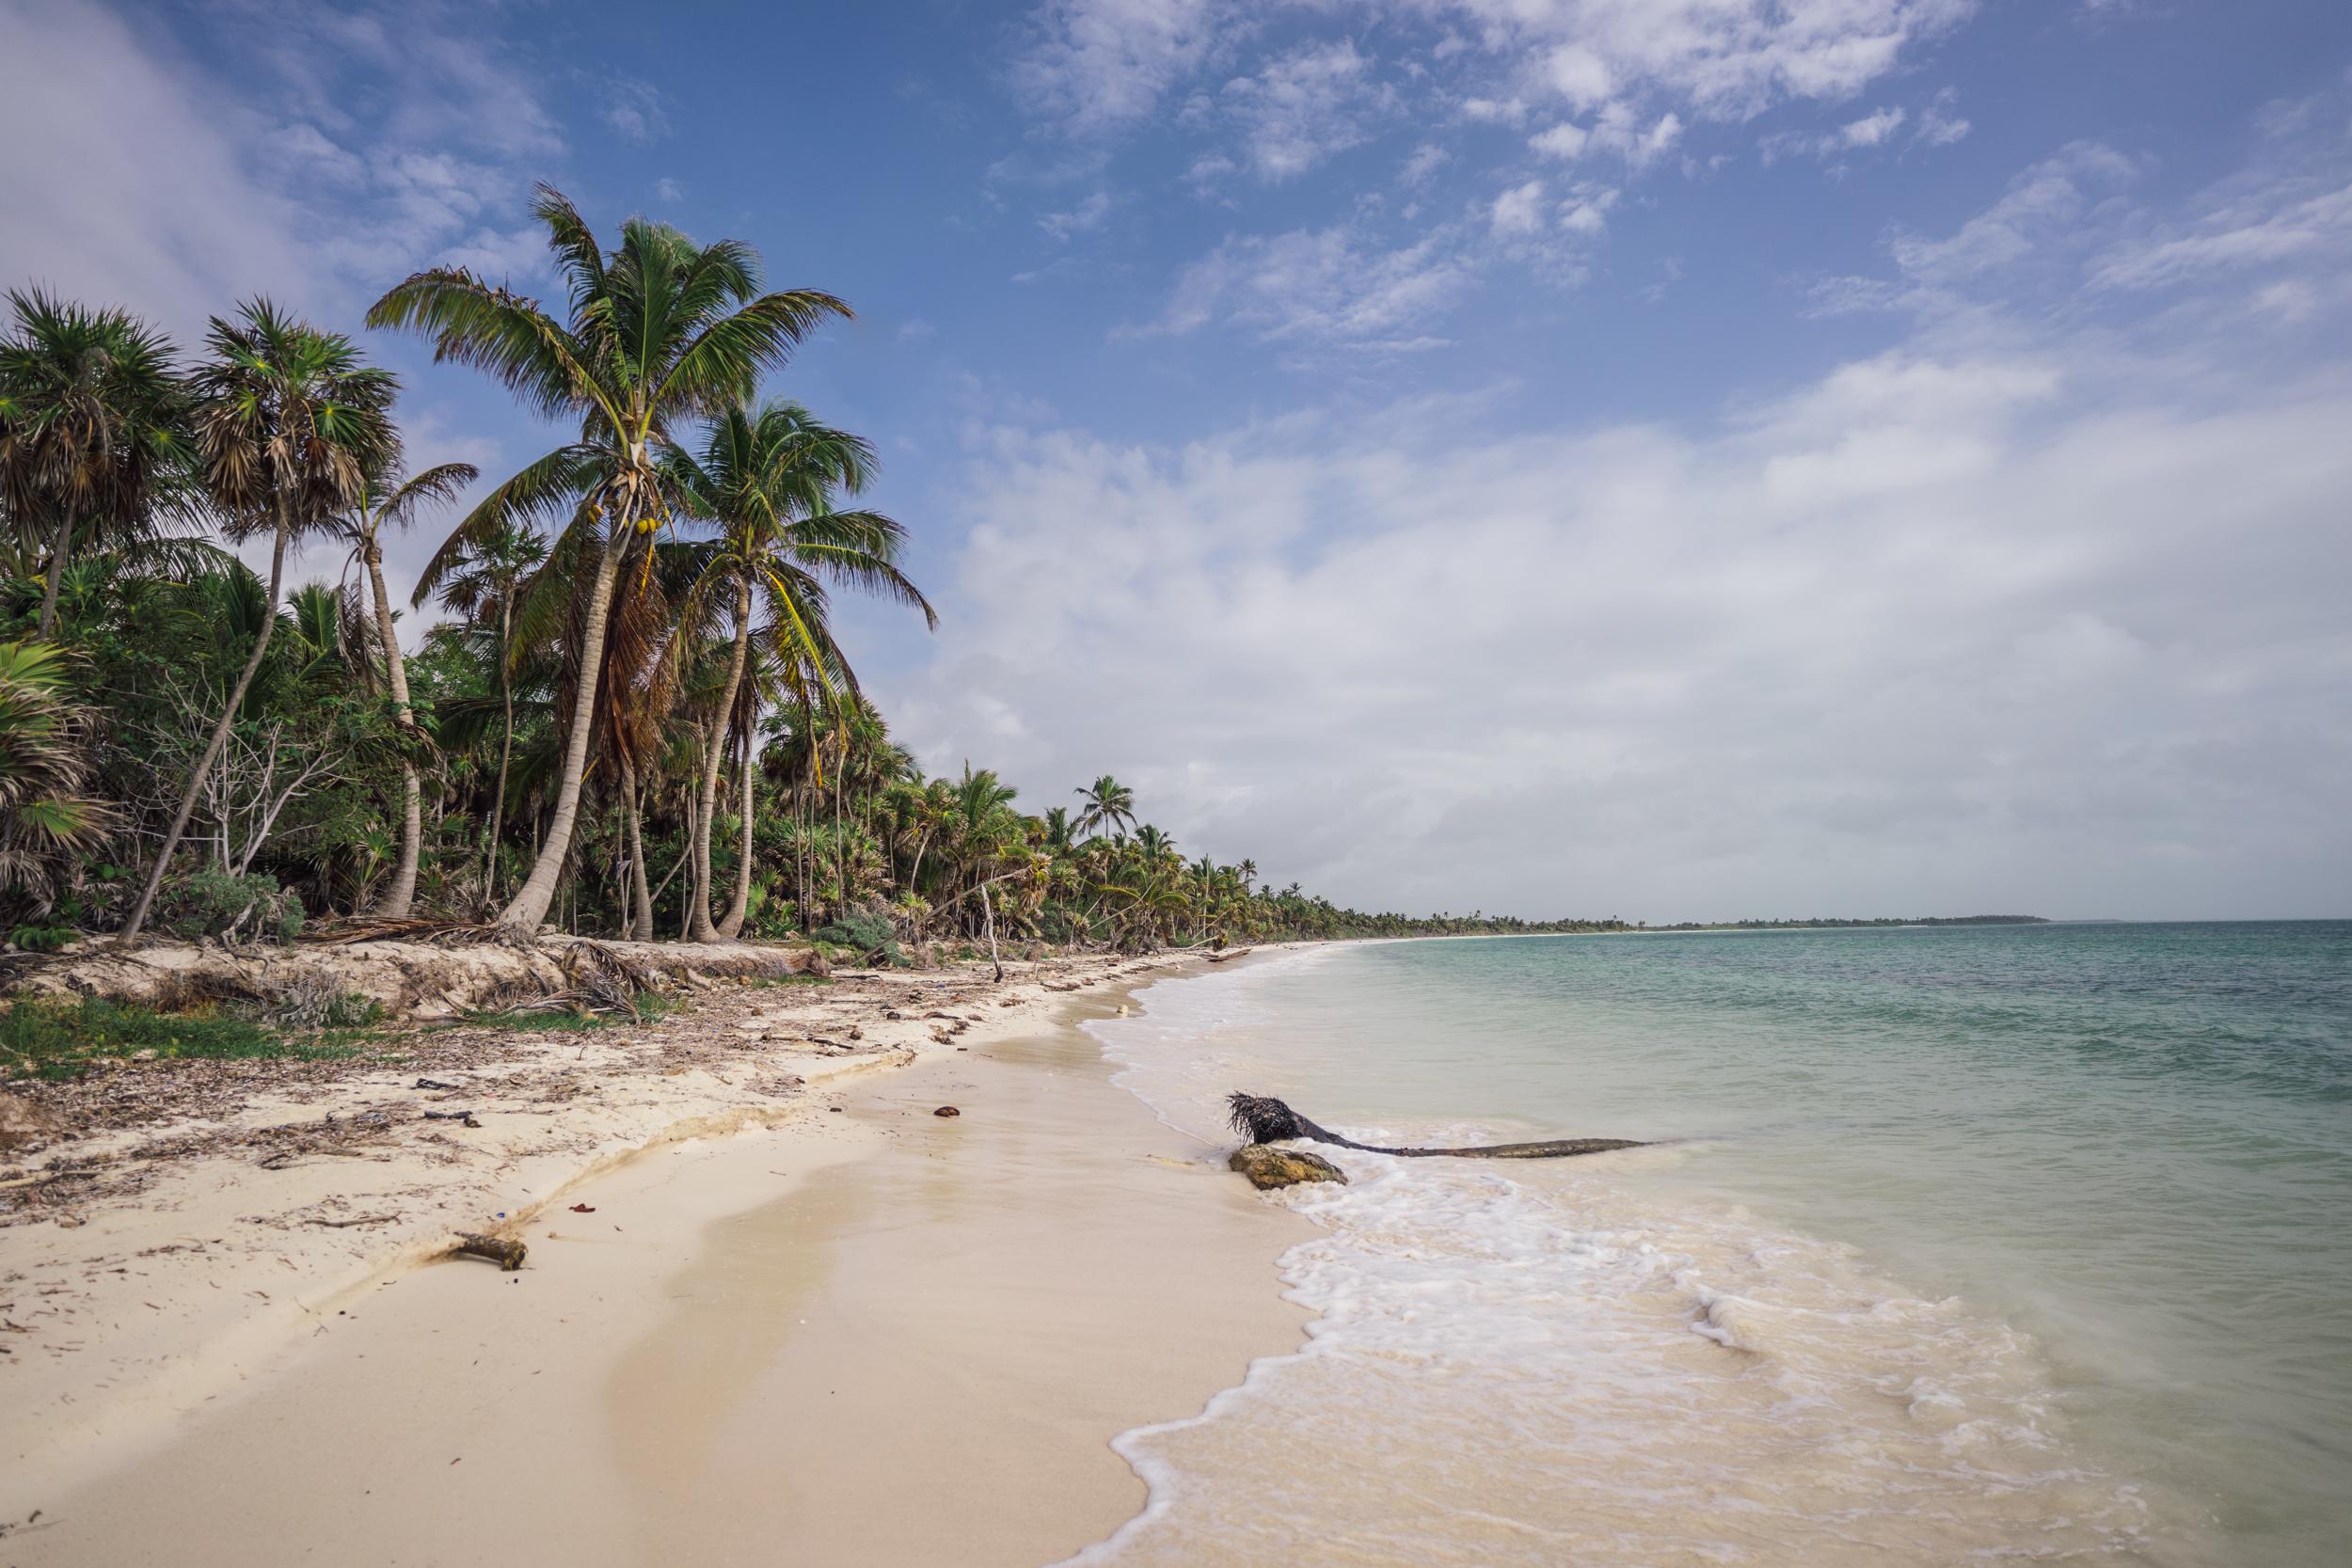 The coast of the Sian Ka'an Biosphere Reserve, Quintana Roo, Mexico